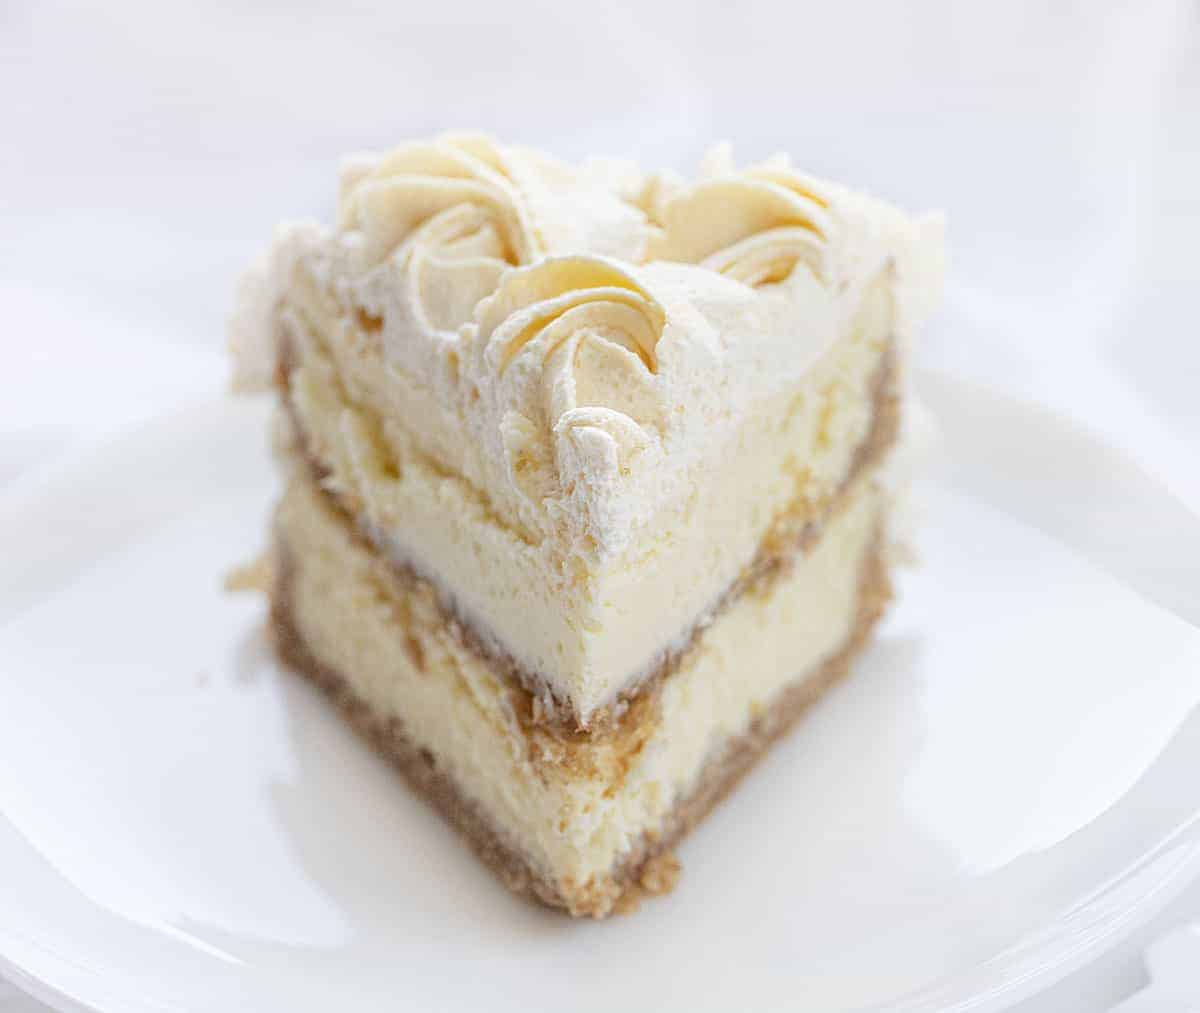 Piece of Double Decker Cheesecake